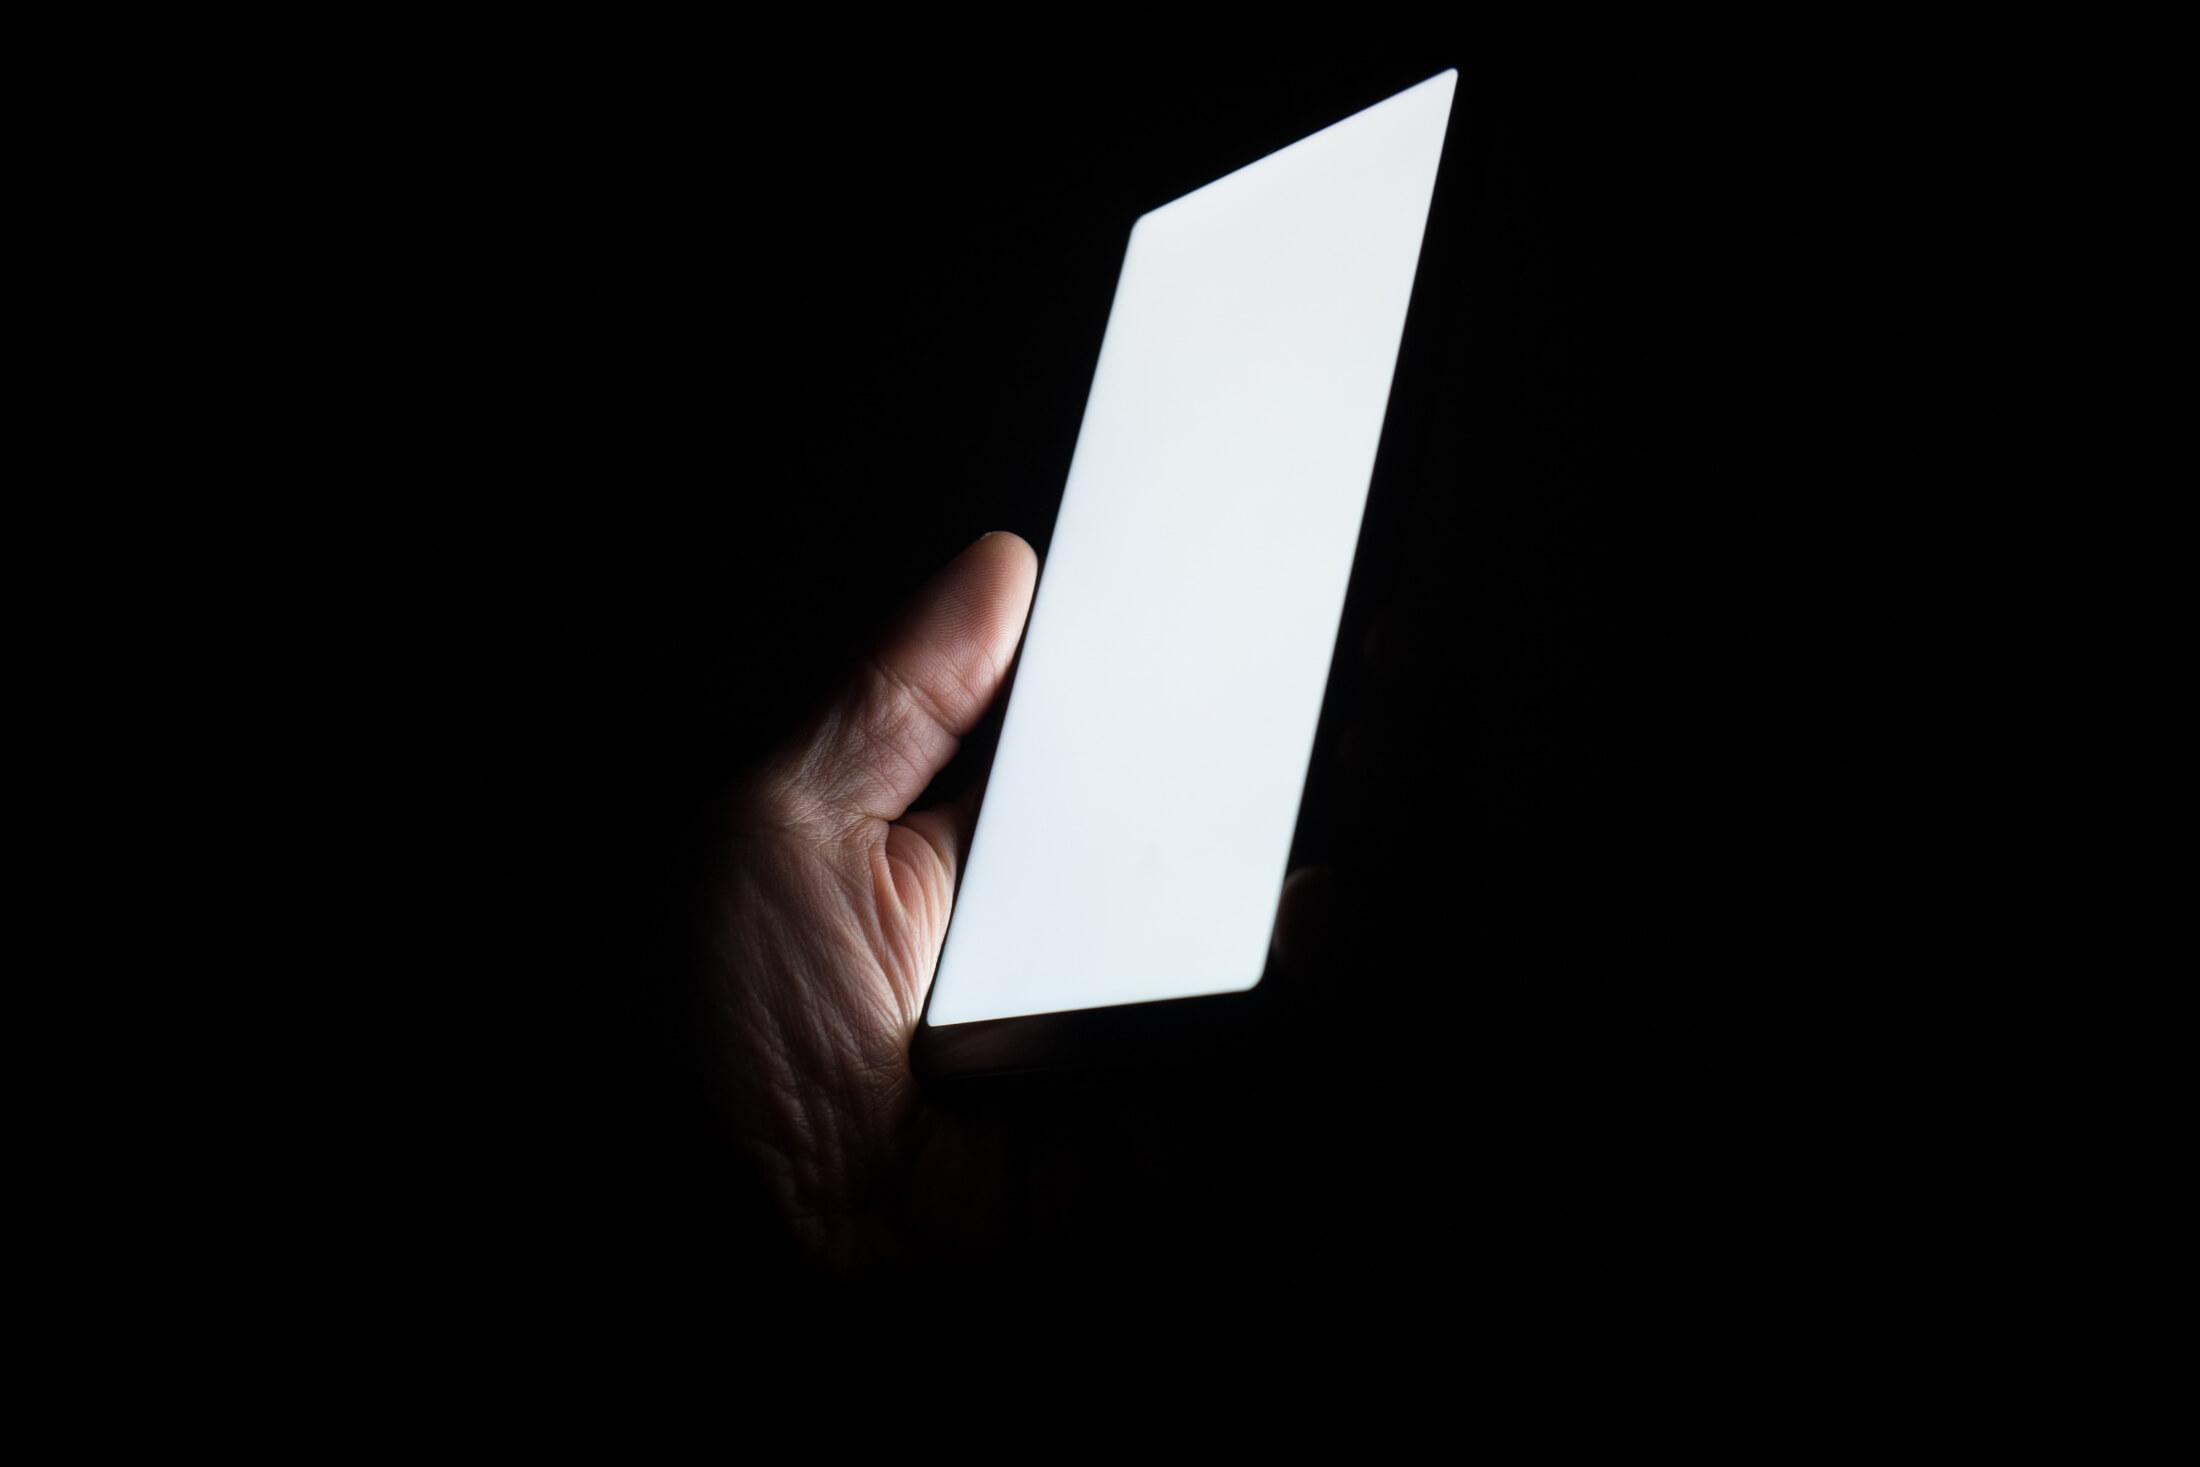 диагональ экрана